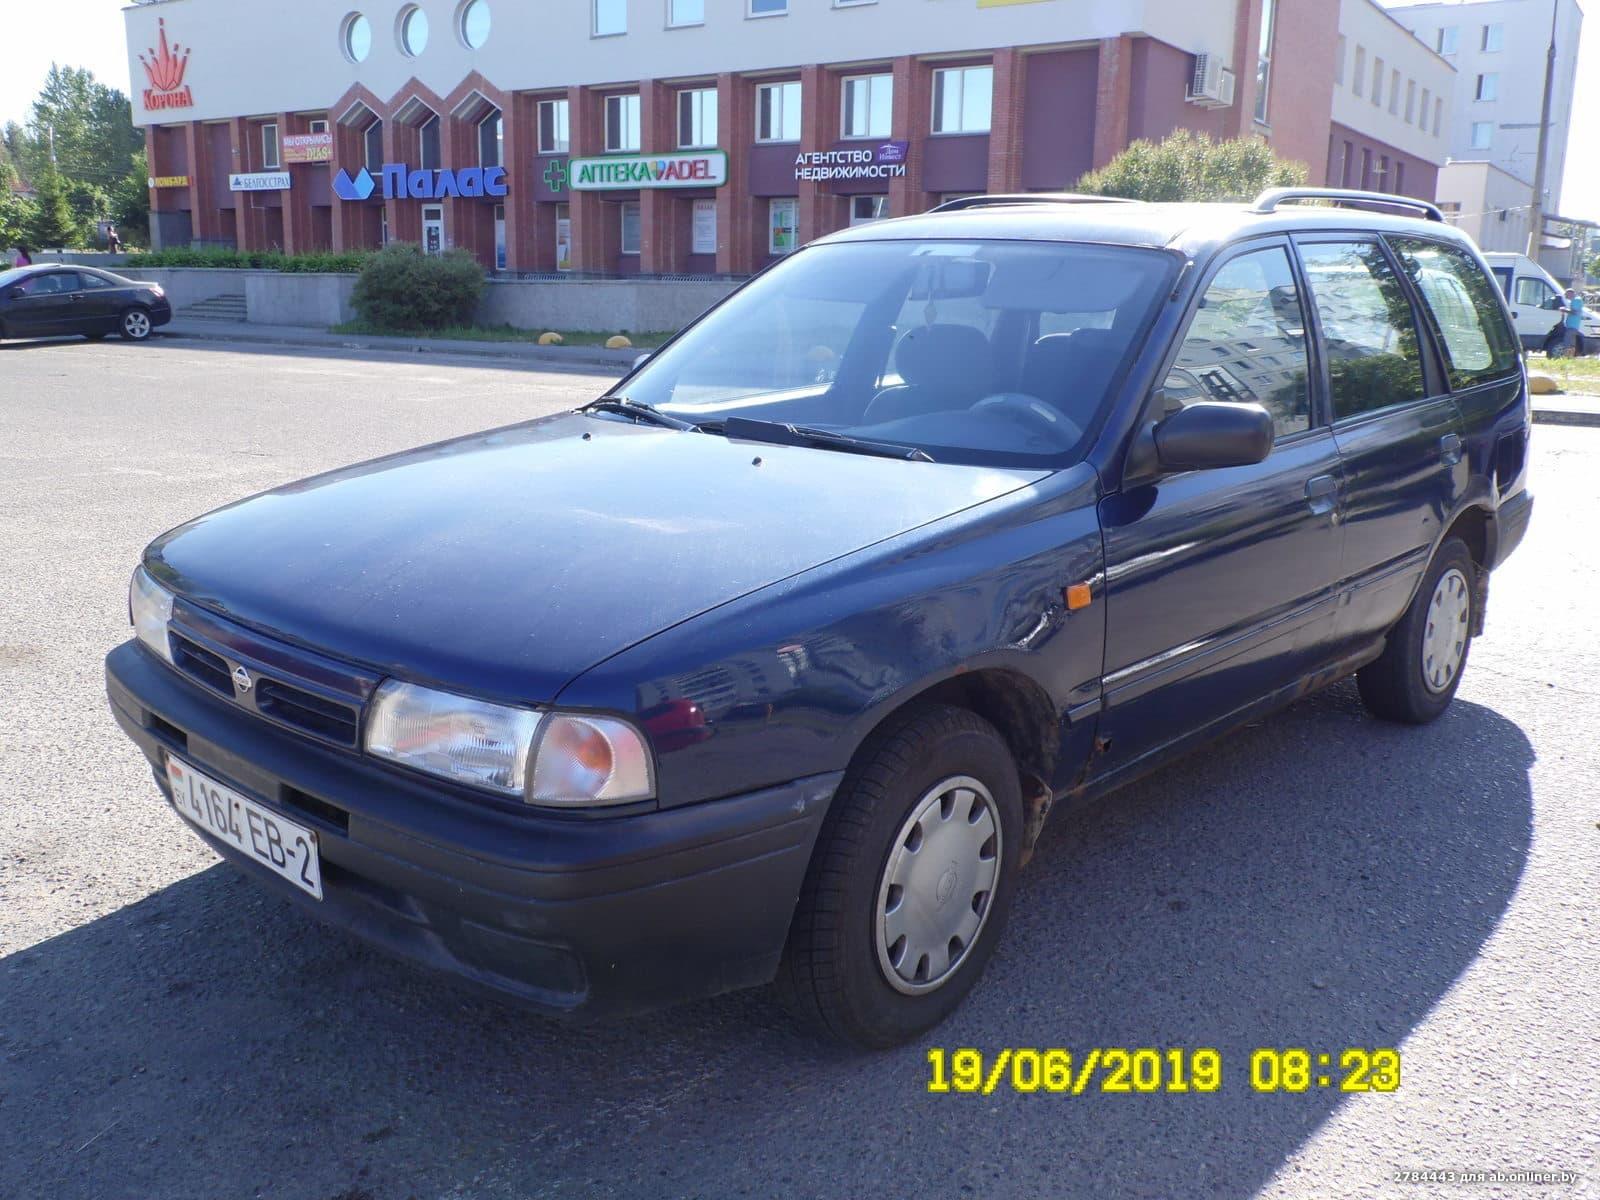 Nissan Sunny dlx